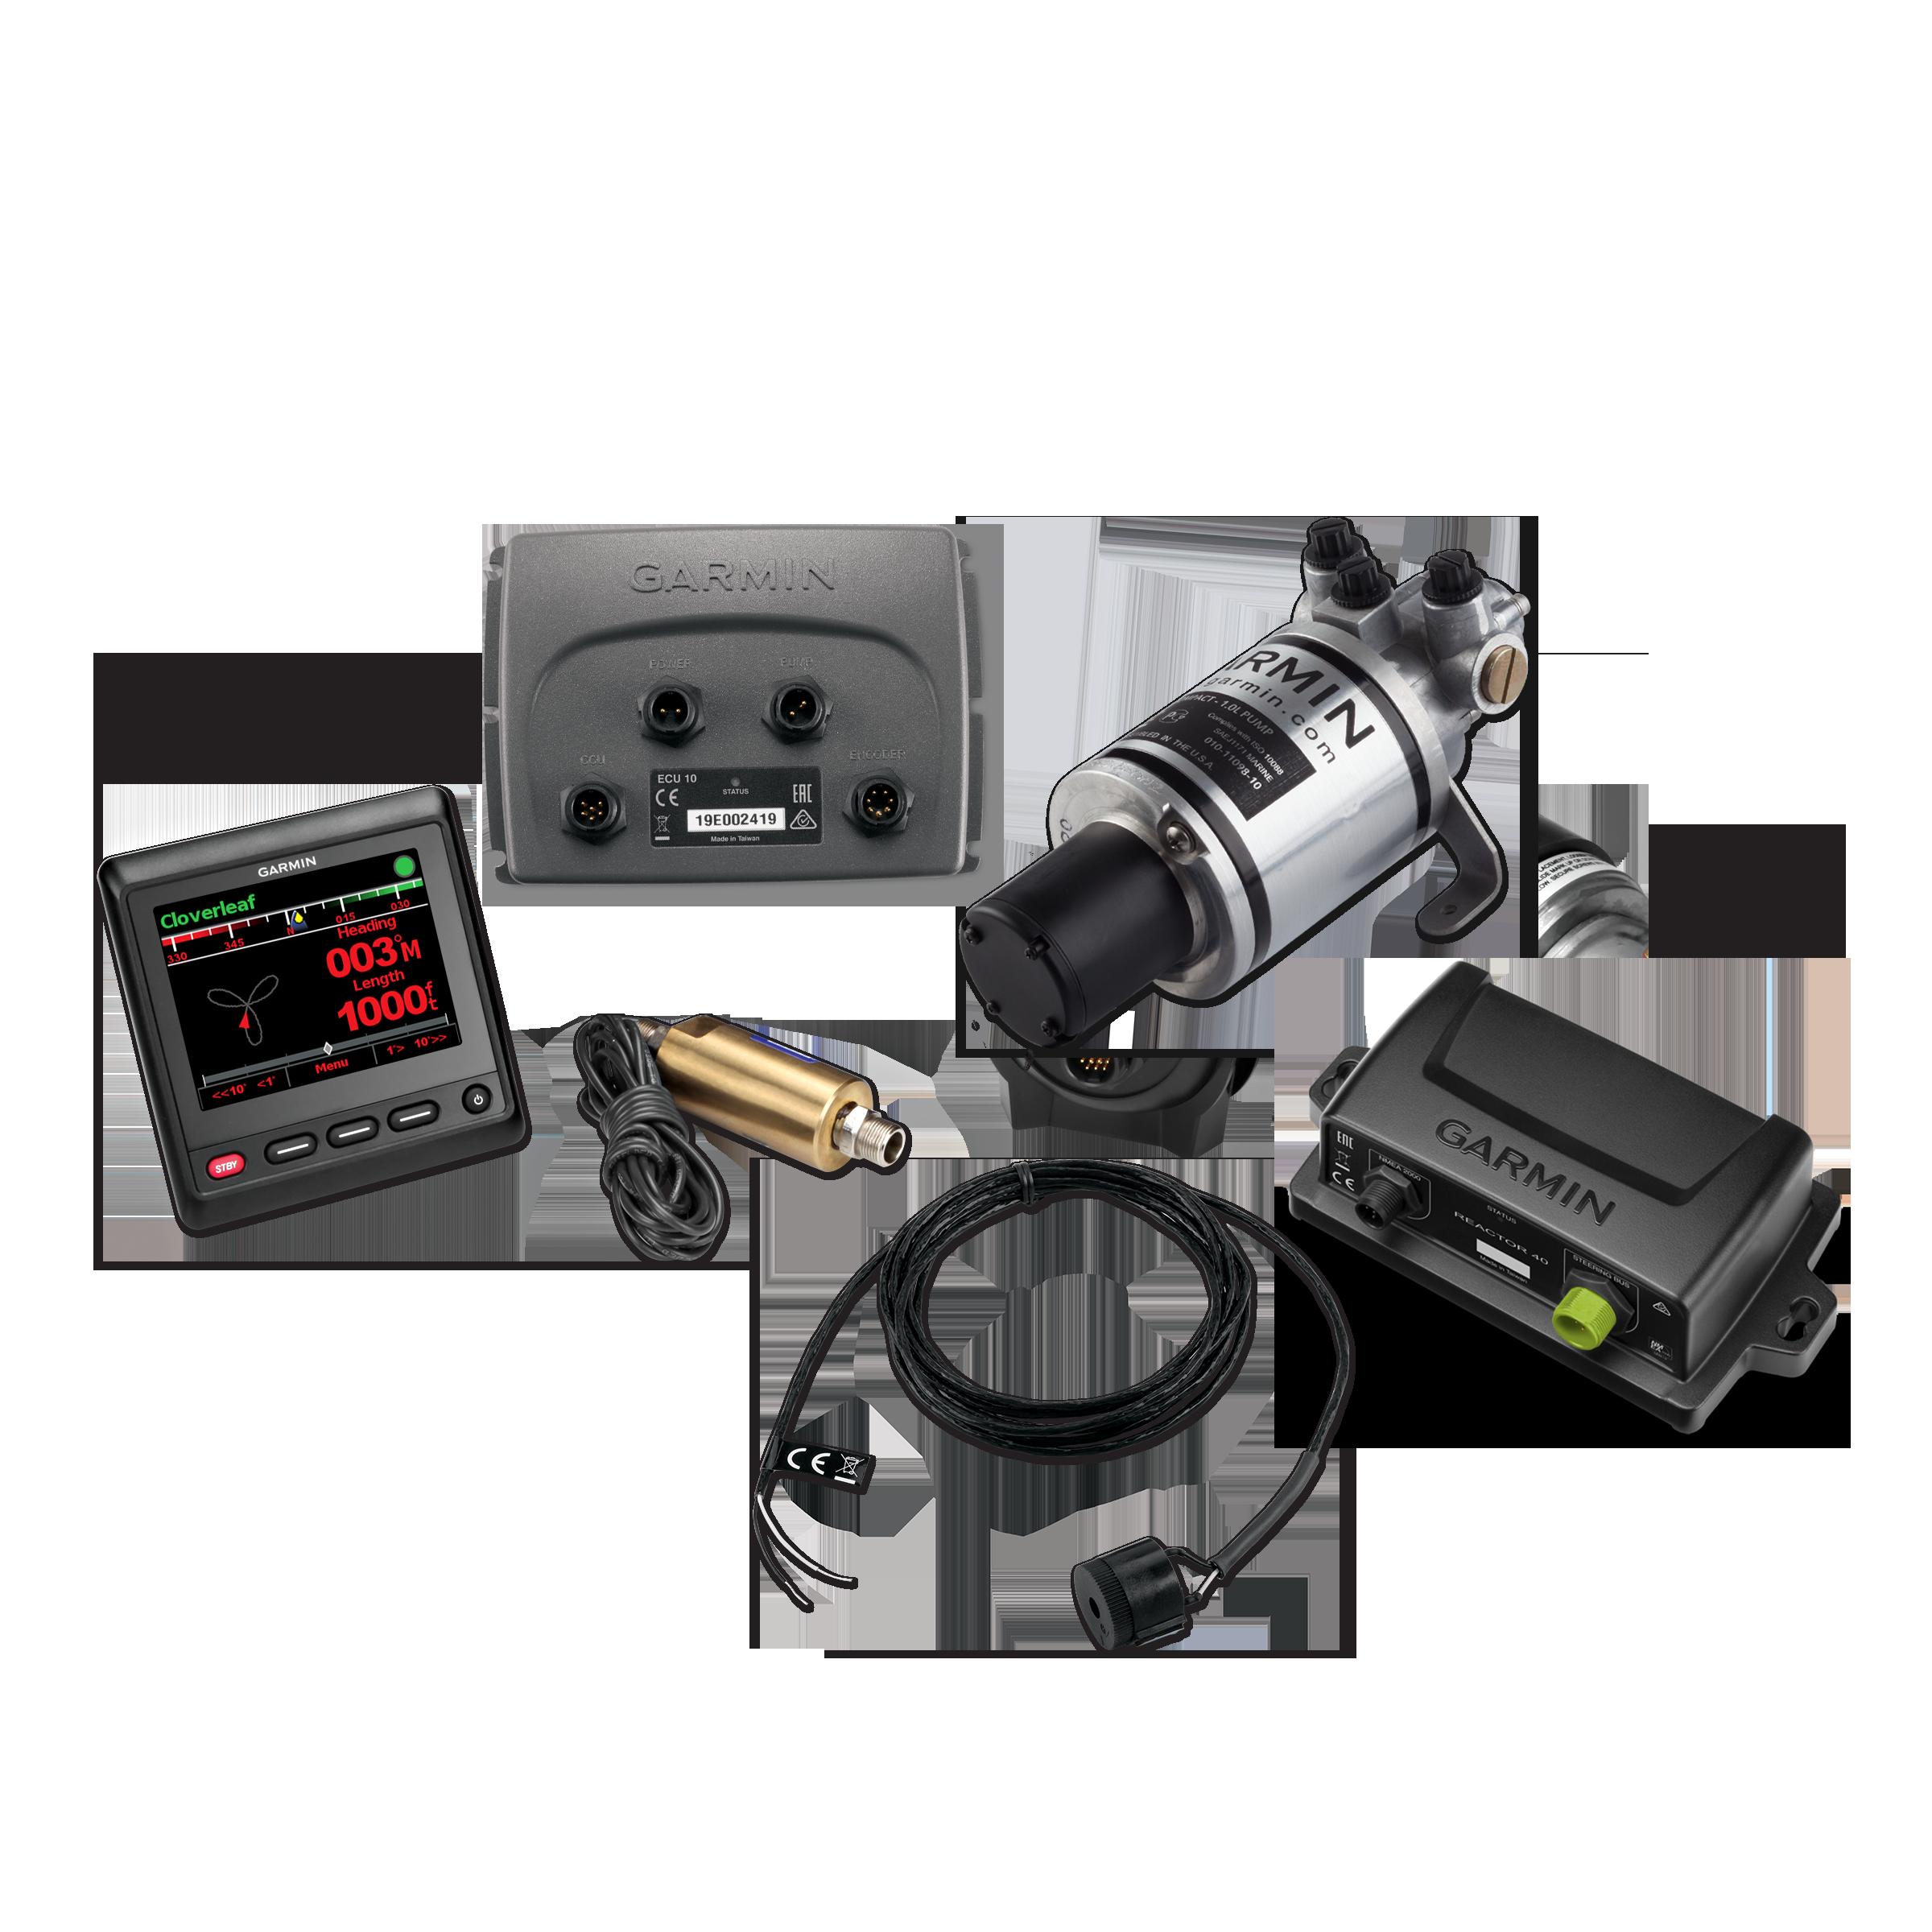 garmn compact reactor 40 garmin hydraulic autopilot ghc 20 shadow drive pack